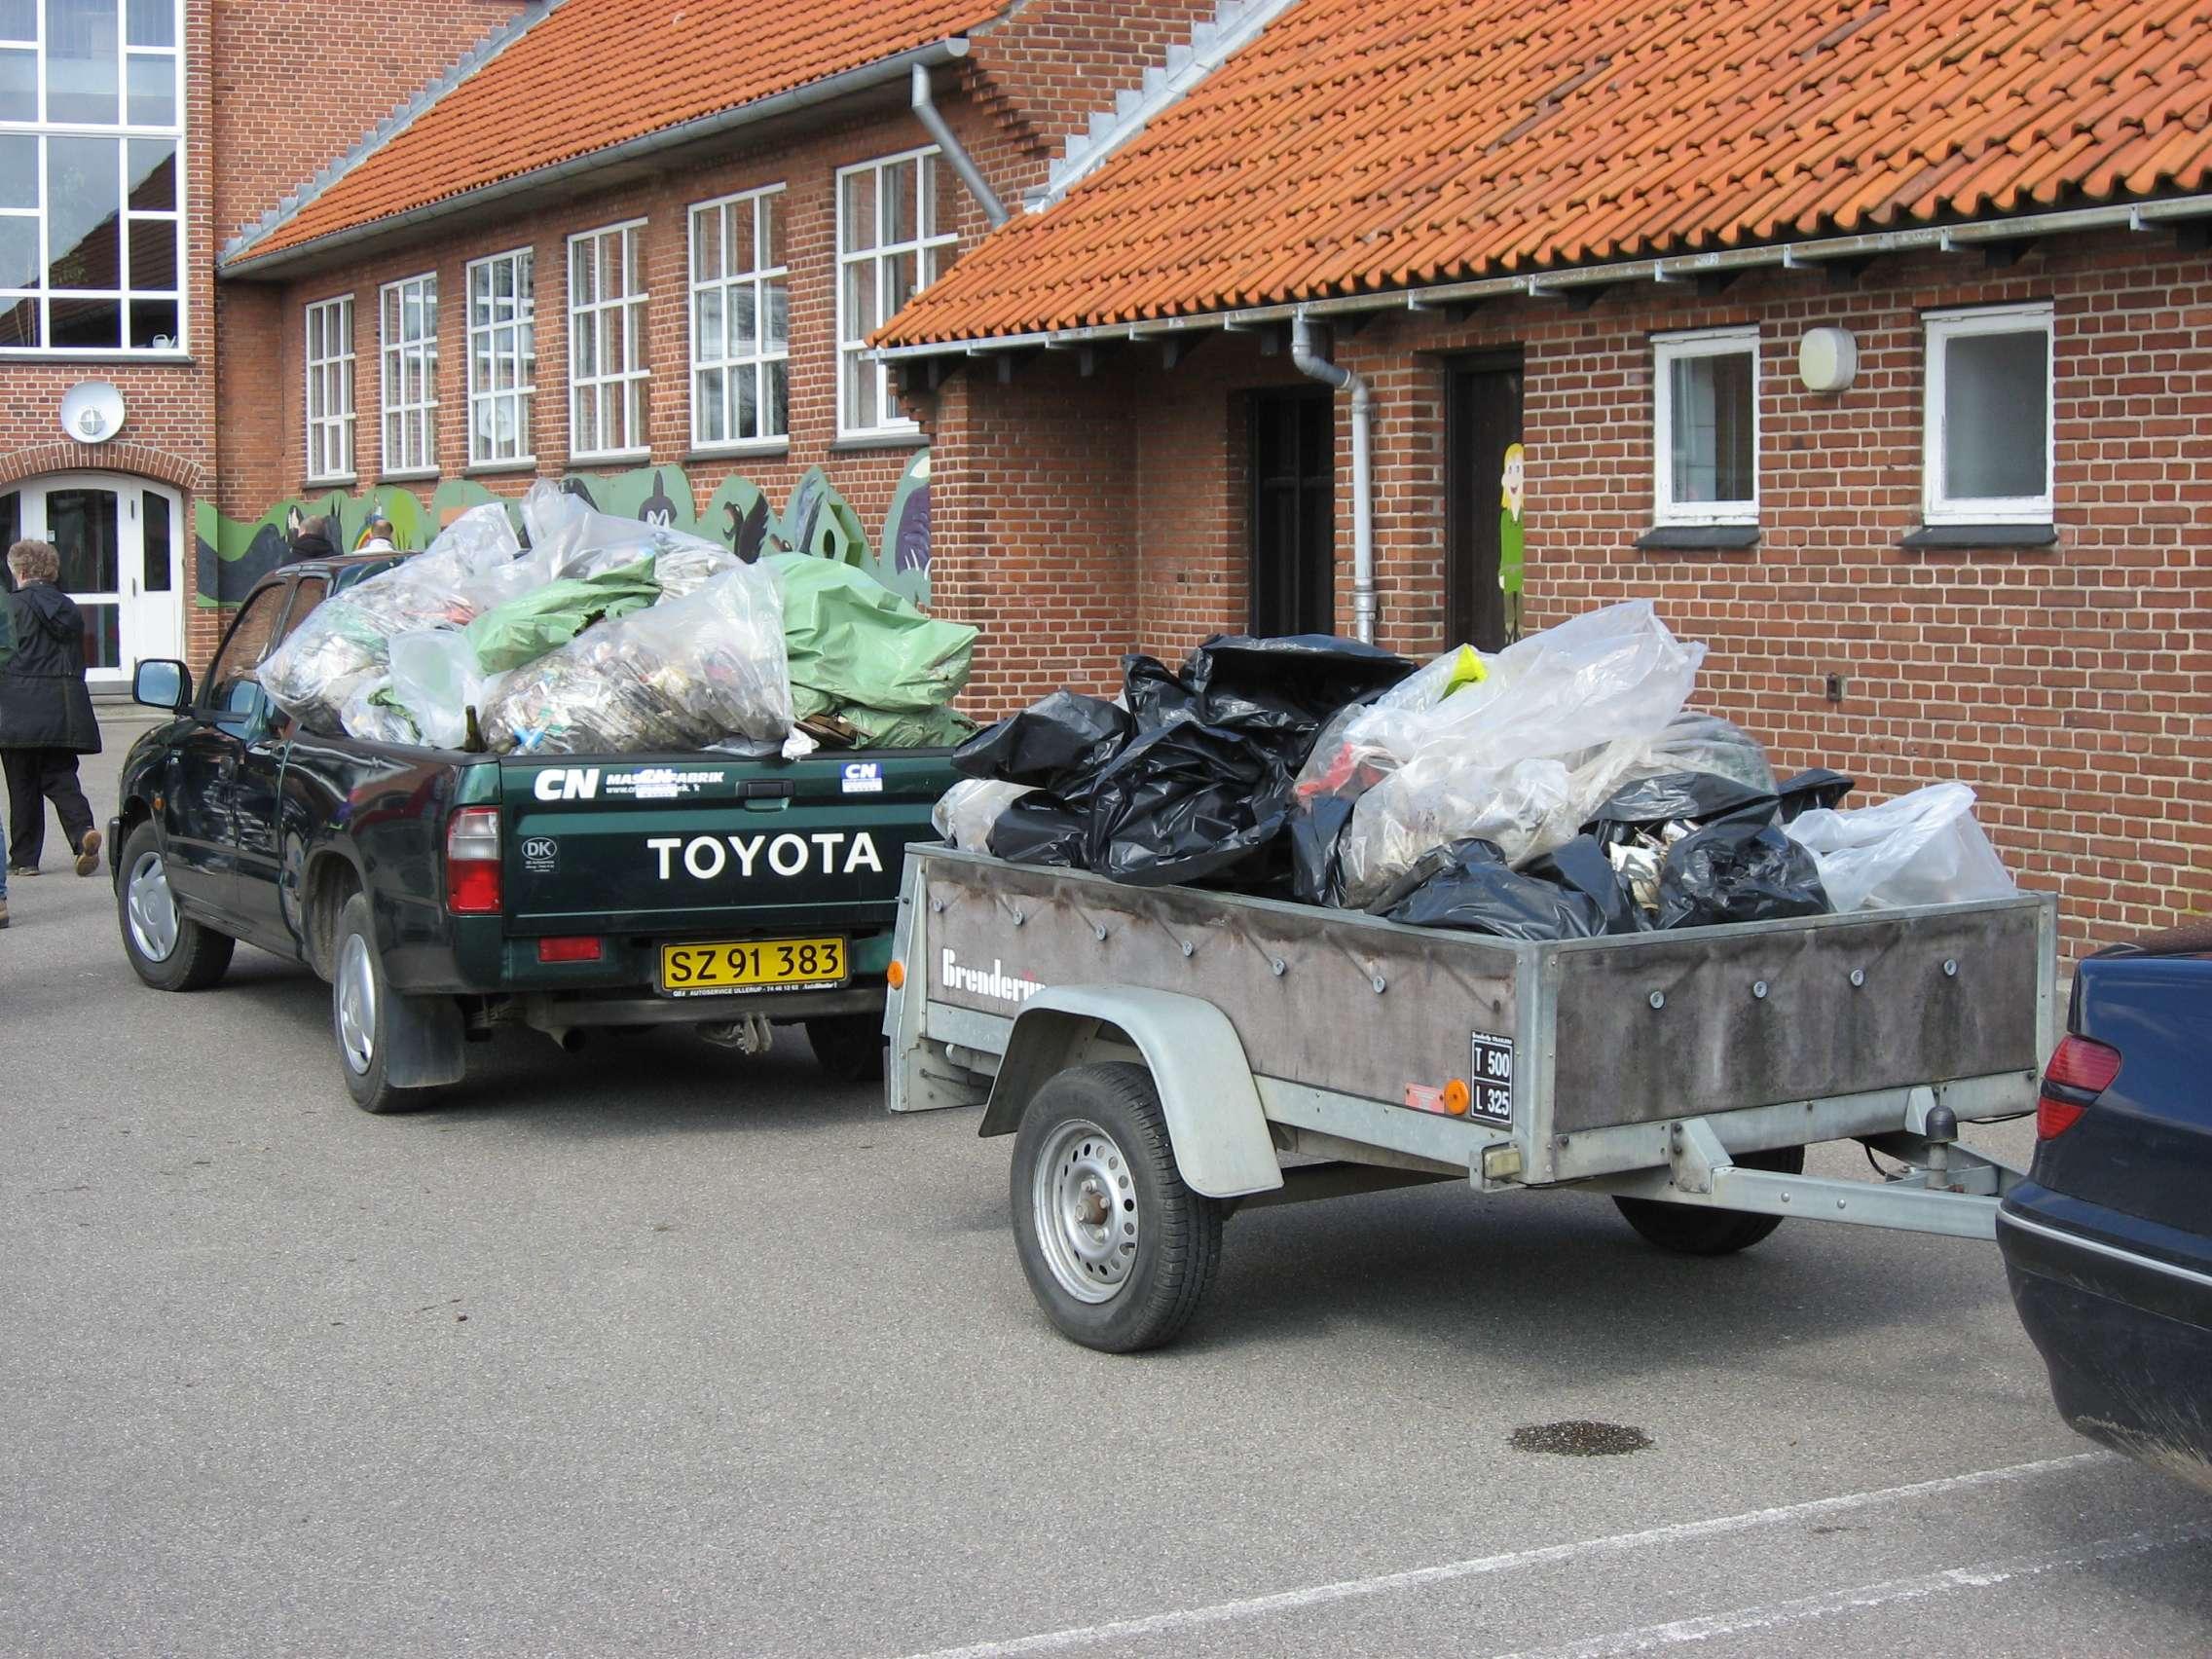 affaldsindsamling2008-029.jpg